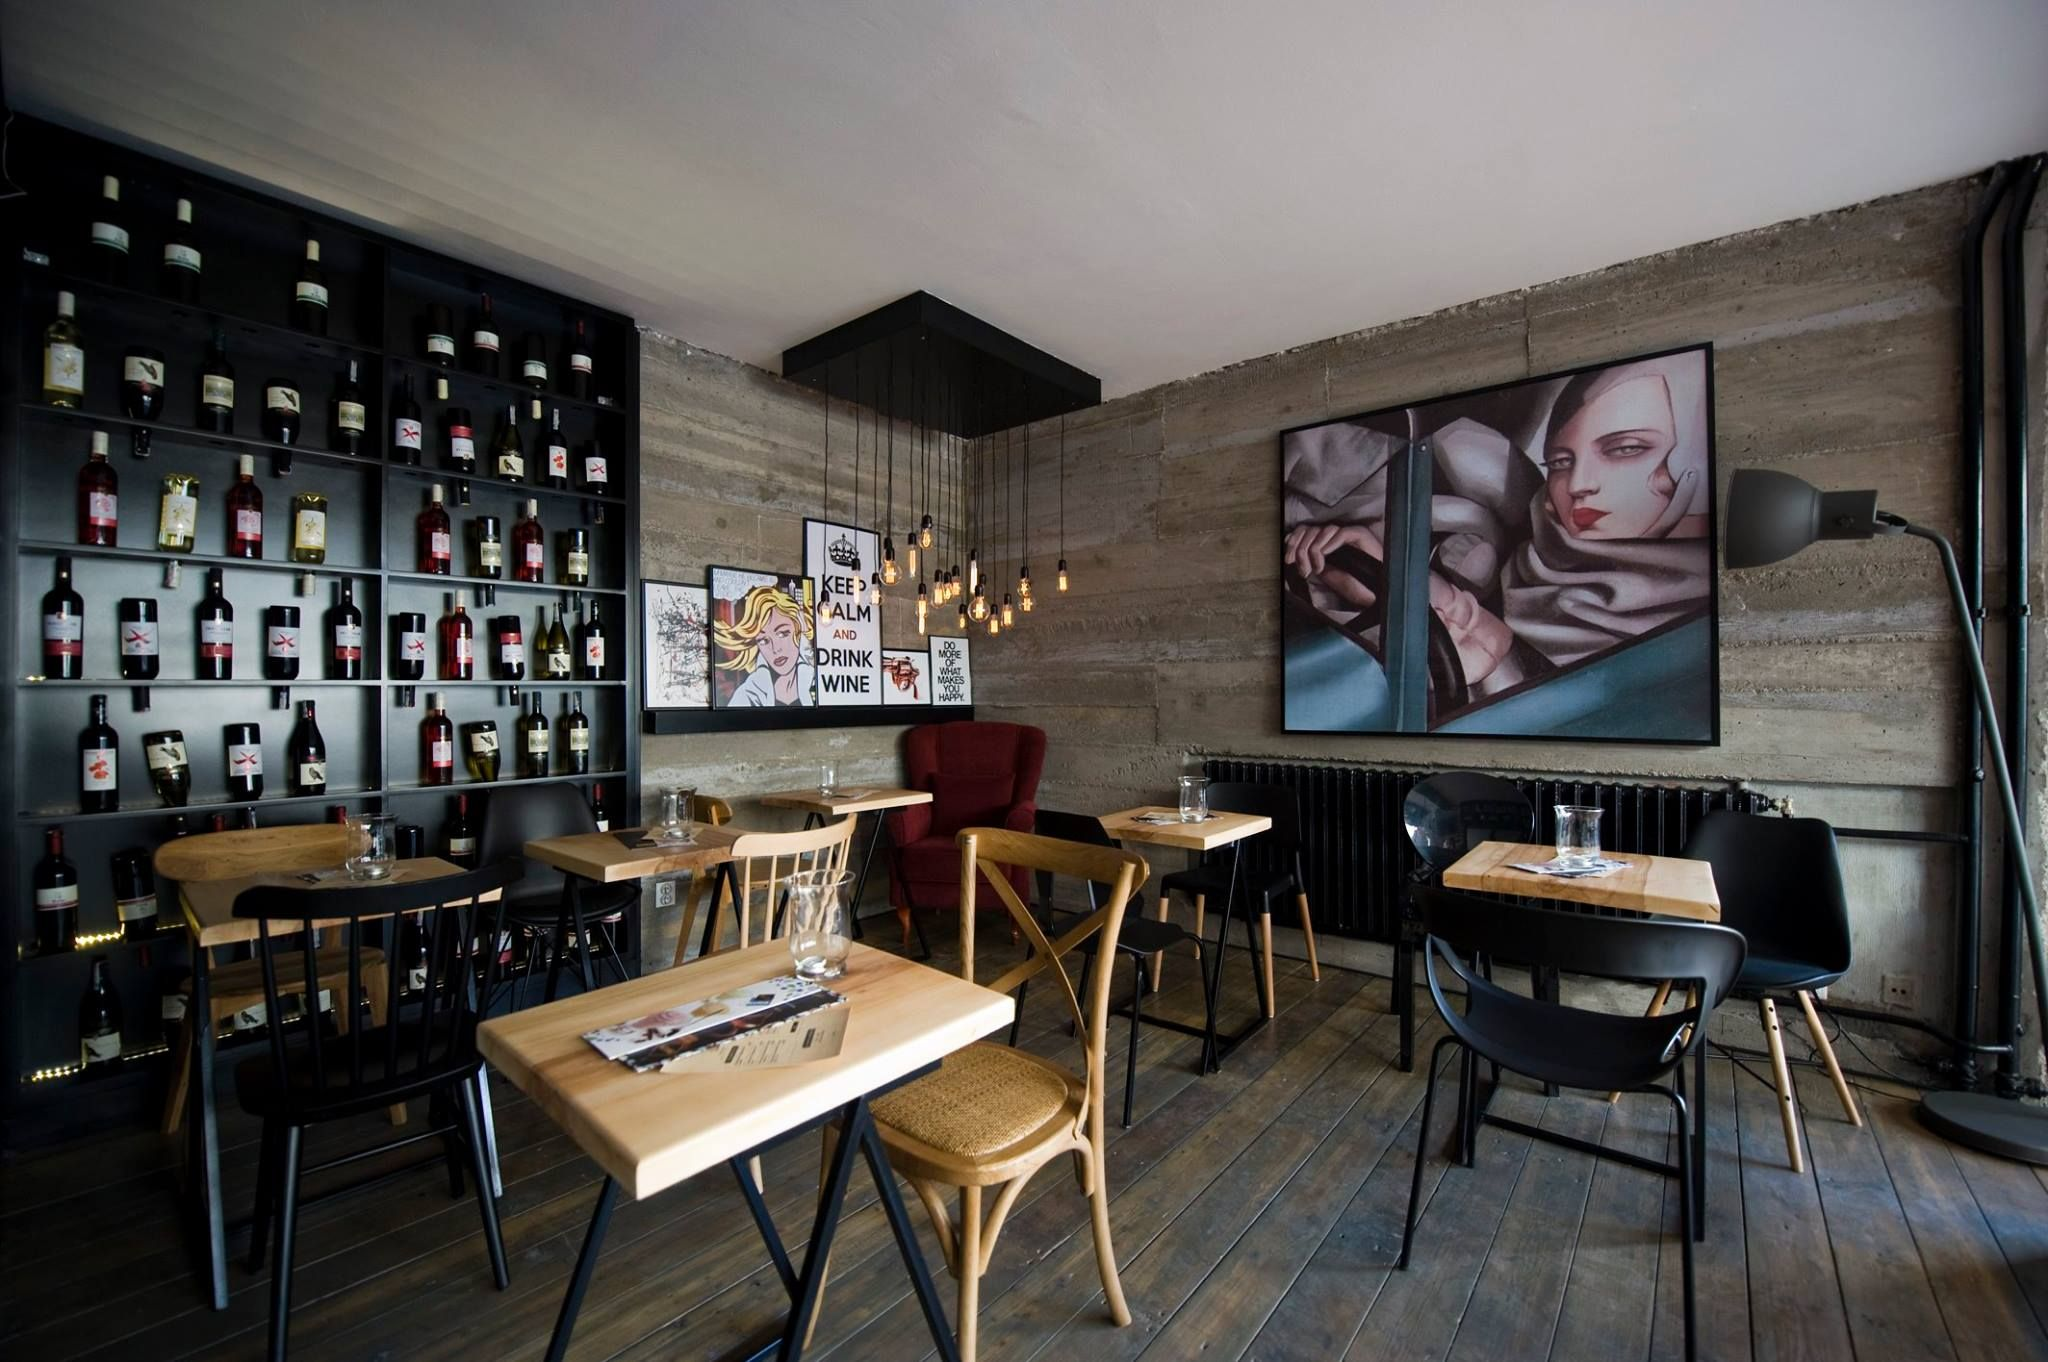 Lulu Cafe Prishtina | Cafe&Restaurants | Pinterest